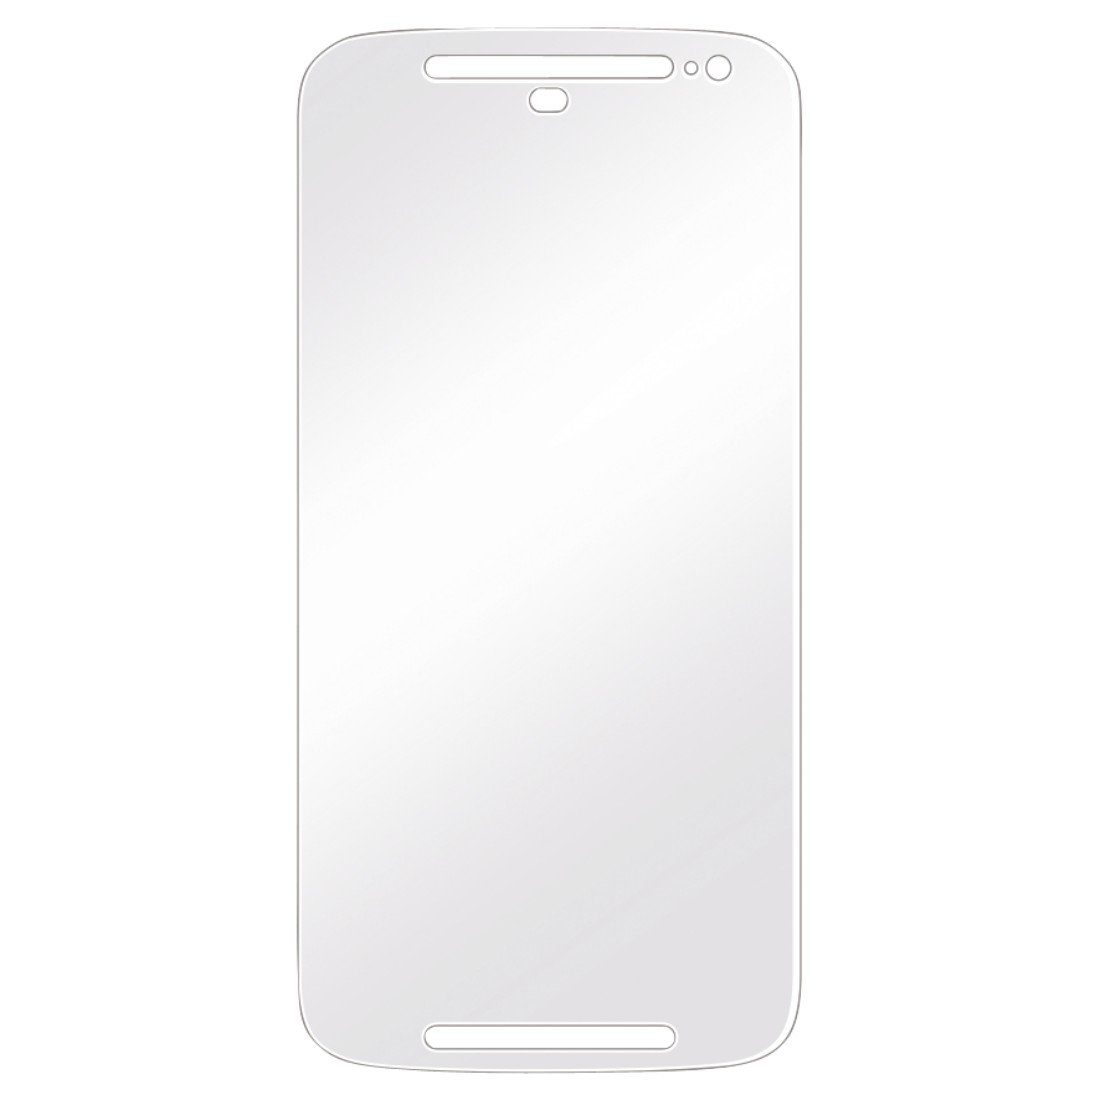 Hama Displayschutzfolie f. Motorola Moto G 2nd Generat., 2er Set »Displayschutz Schutzfolie«